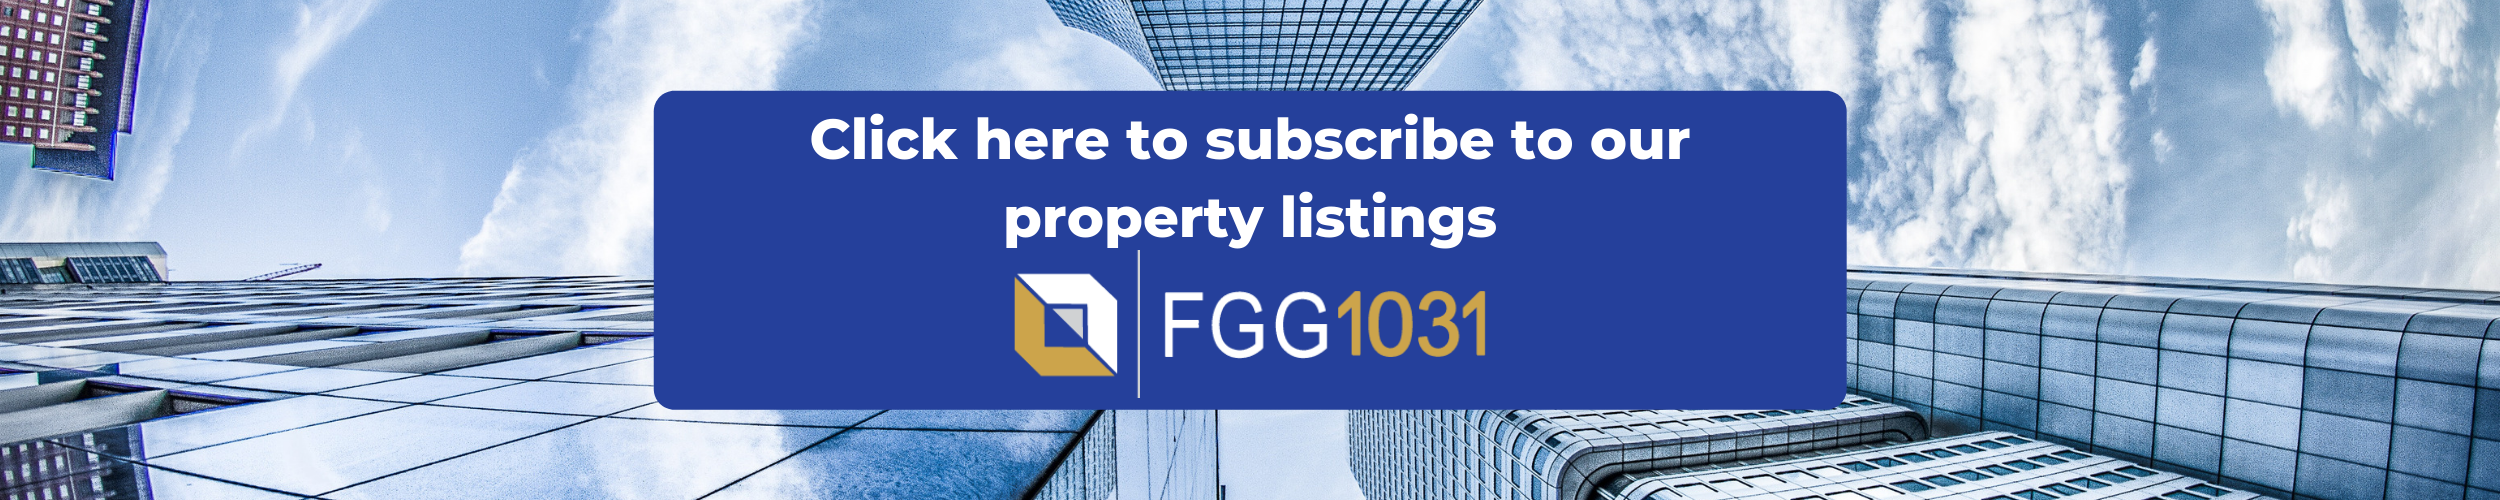 property-listings-1